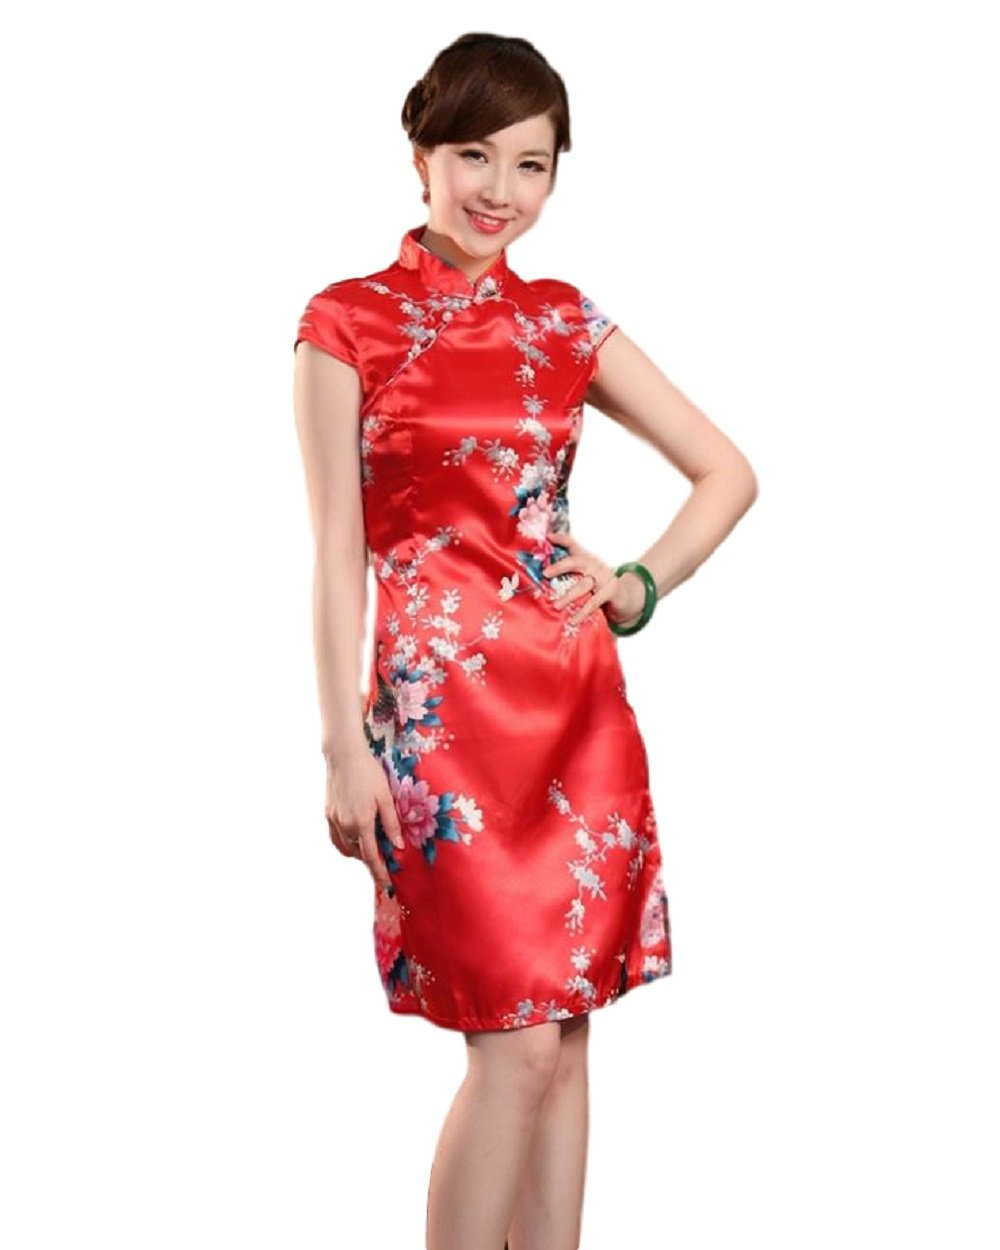 Women's Mini Chinese Dress Cheongsam [Red/Blue/Pink] Mandarin Gown Qipao China Dress